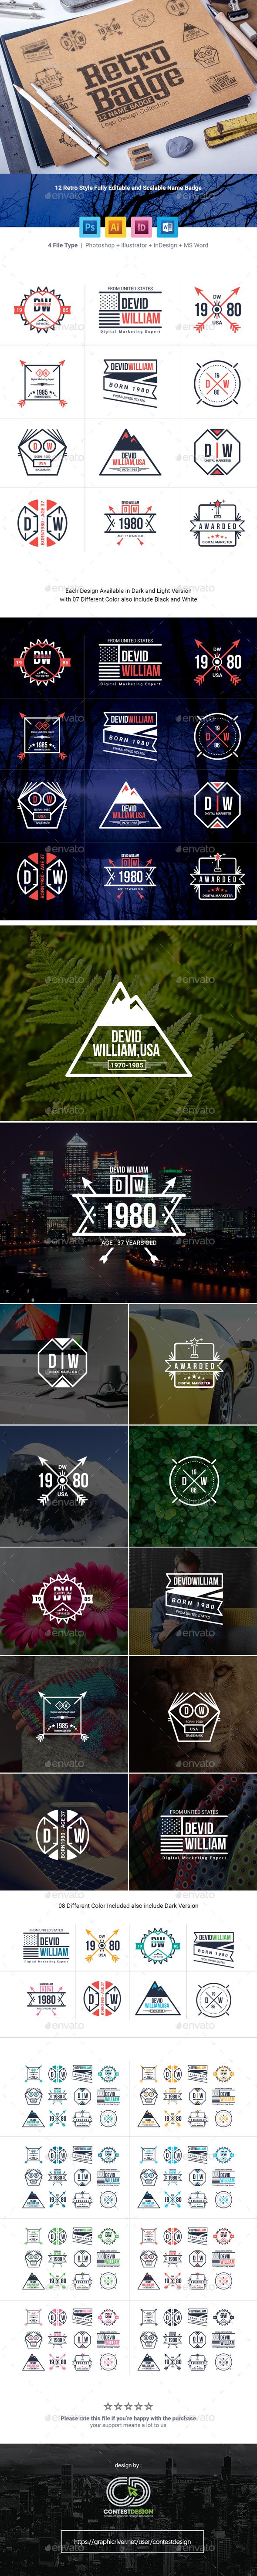 GraphicRiver Retro Badge Name Badge & Logo Collection 20465702